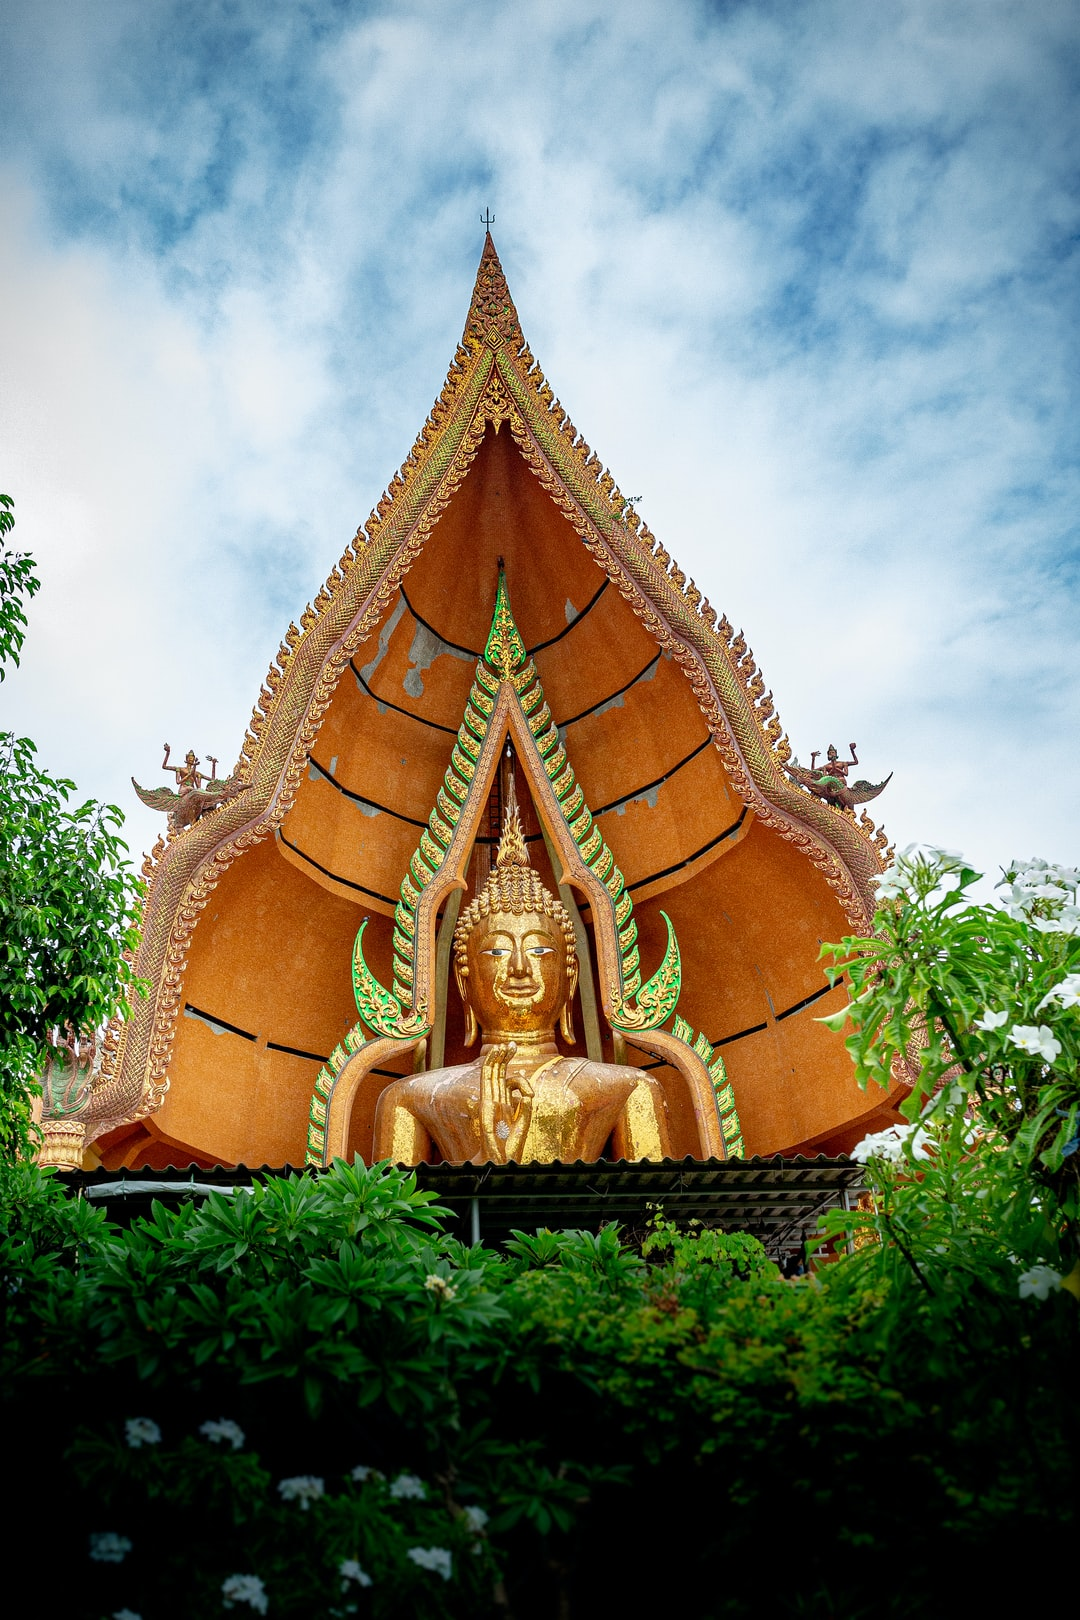 Big Buddha Statue at Wat Tham Sua Temple in Kanchanaburi Province